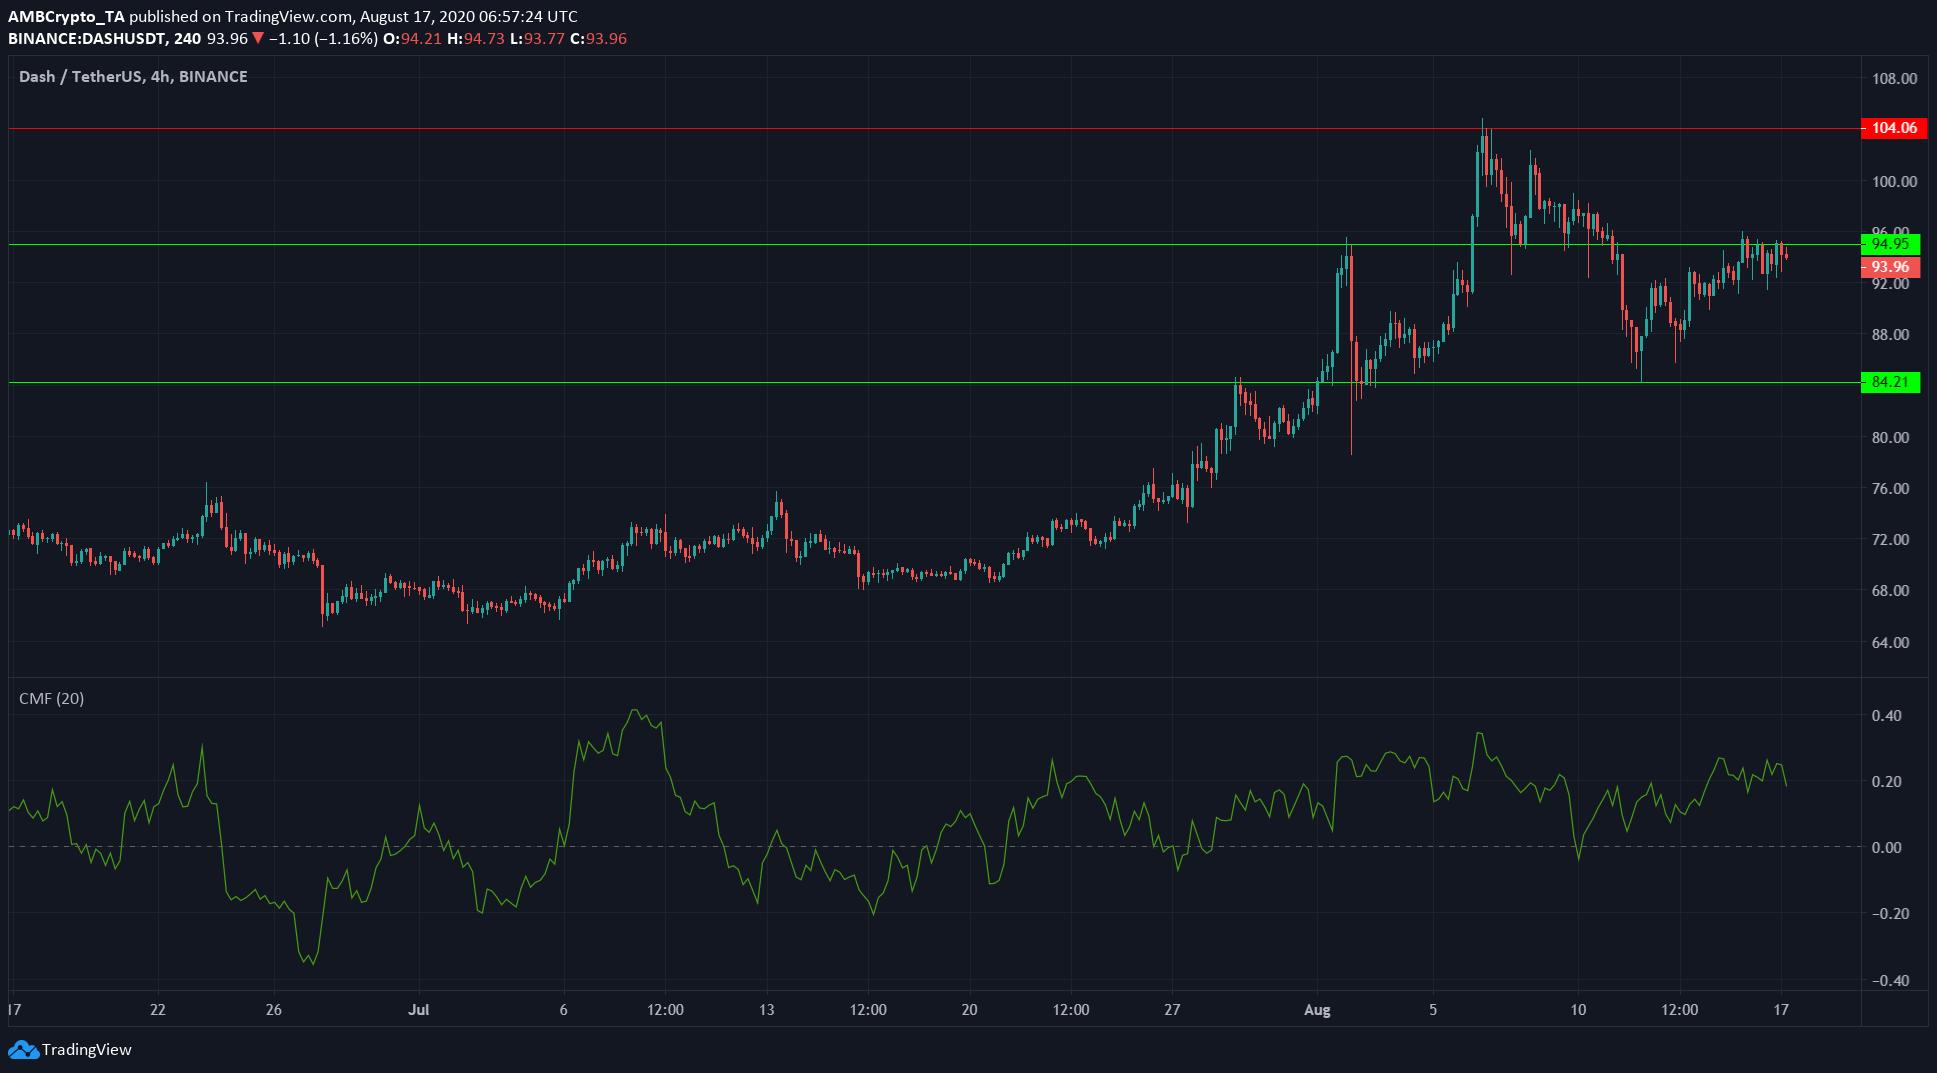 Dash, Synthetix, Litecoin Price Analysis: 17 August